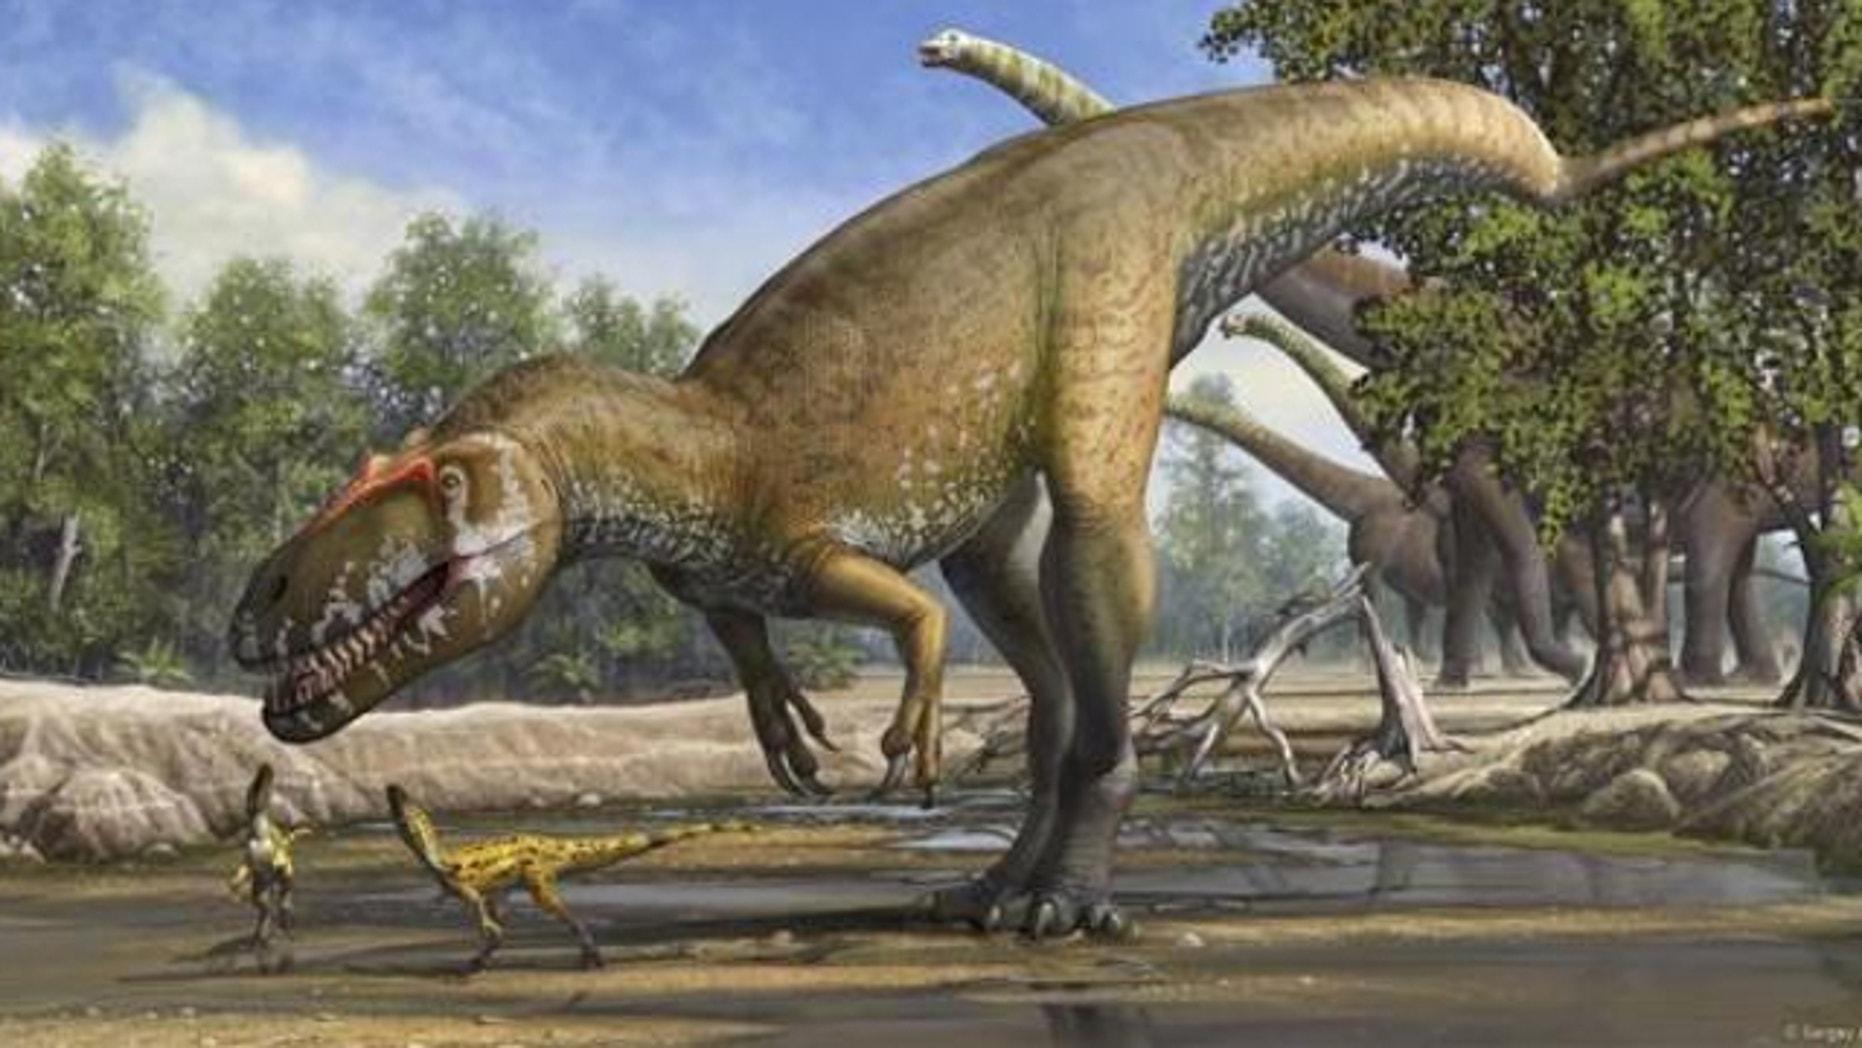 A Torvosaurus gurneyi dinosaur is seen in an undated artist's rendering.